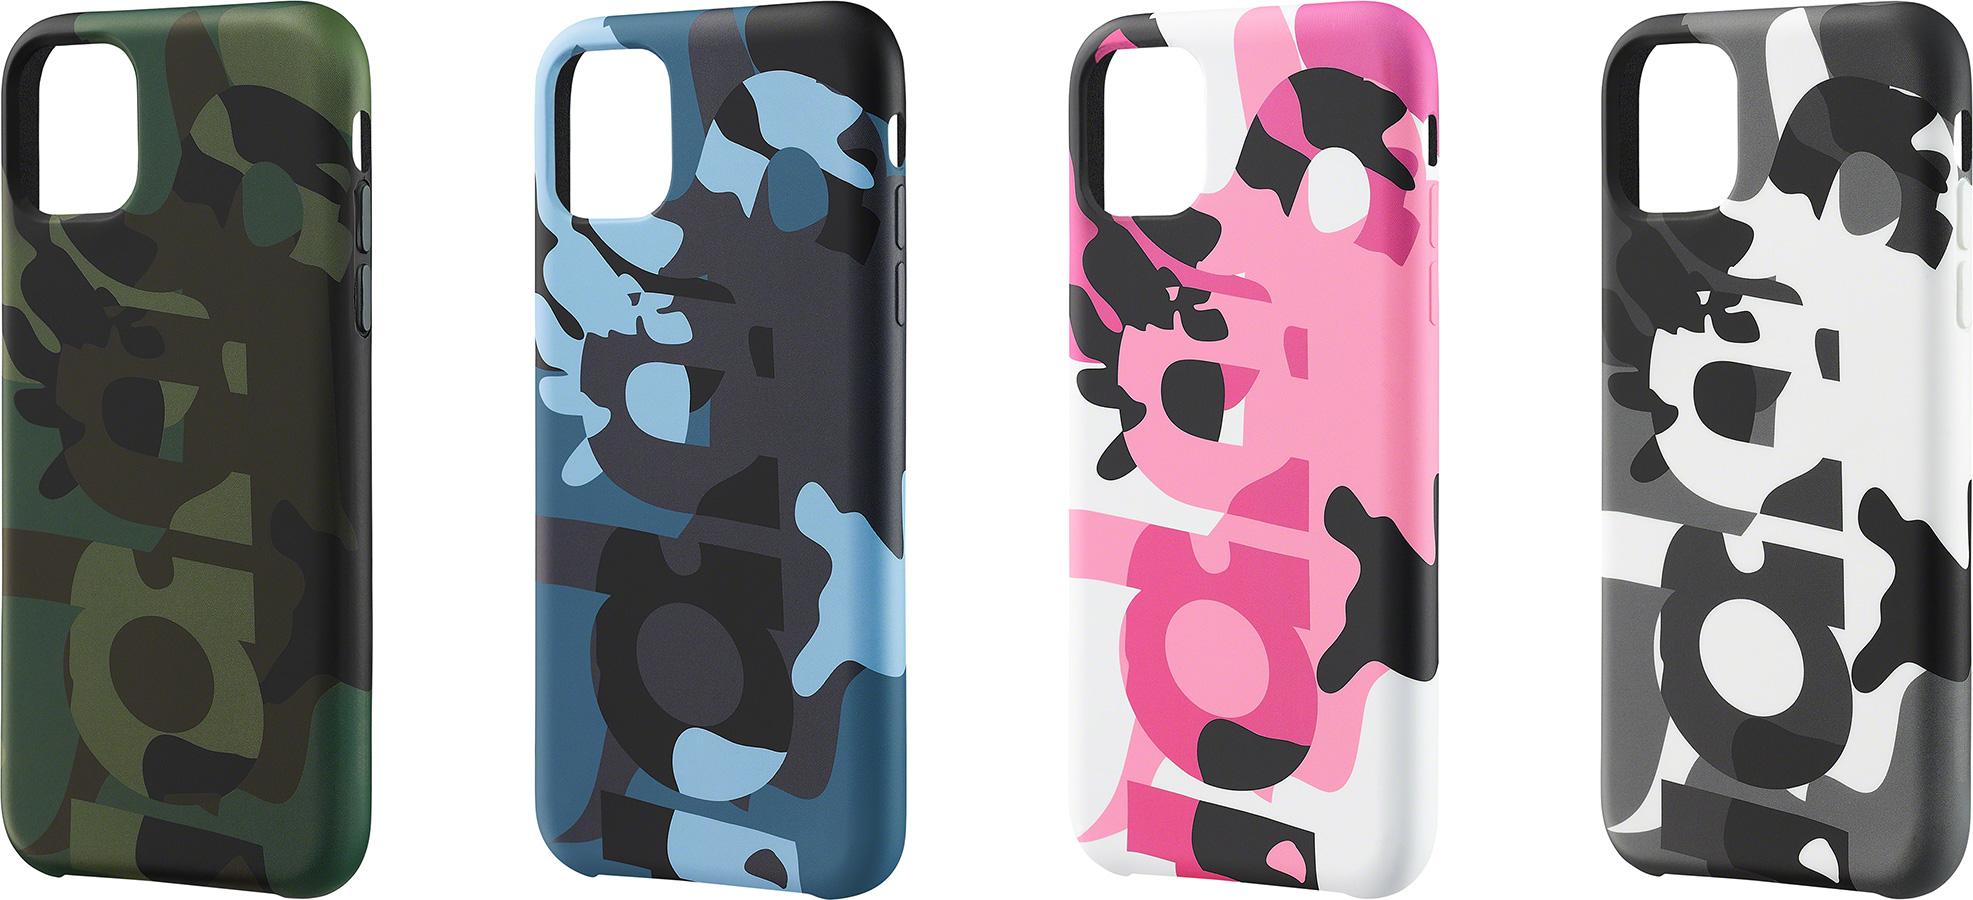 Supreme 2020fw Camo iPhone Case シュプリーム カモ アイフォン ケース